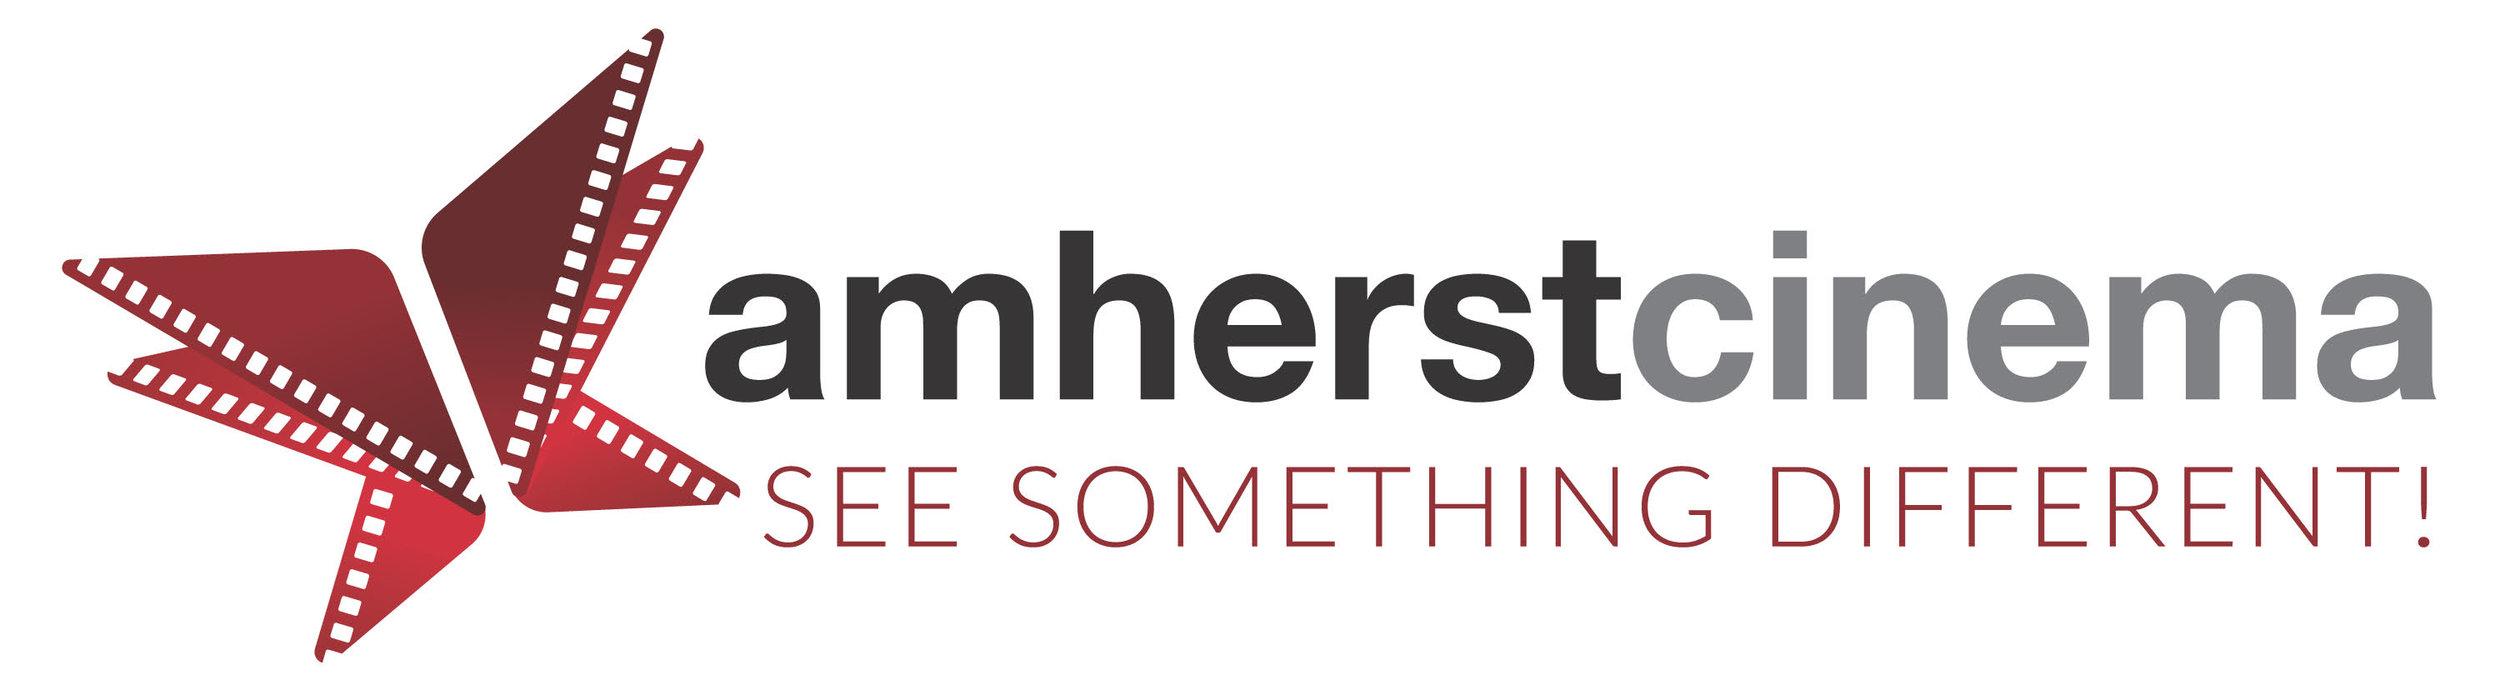 AmherstCinema-logo.jpg